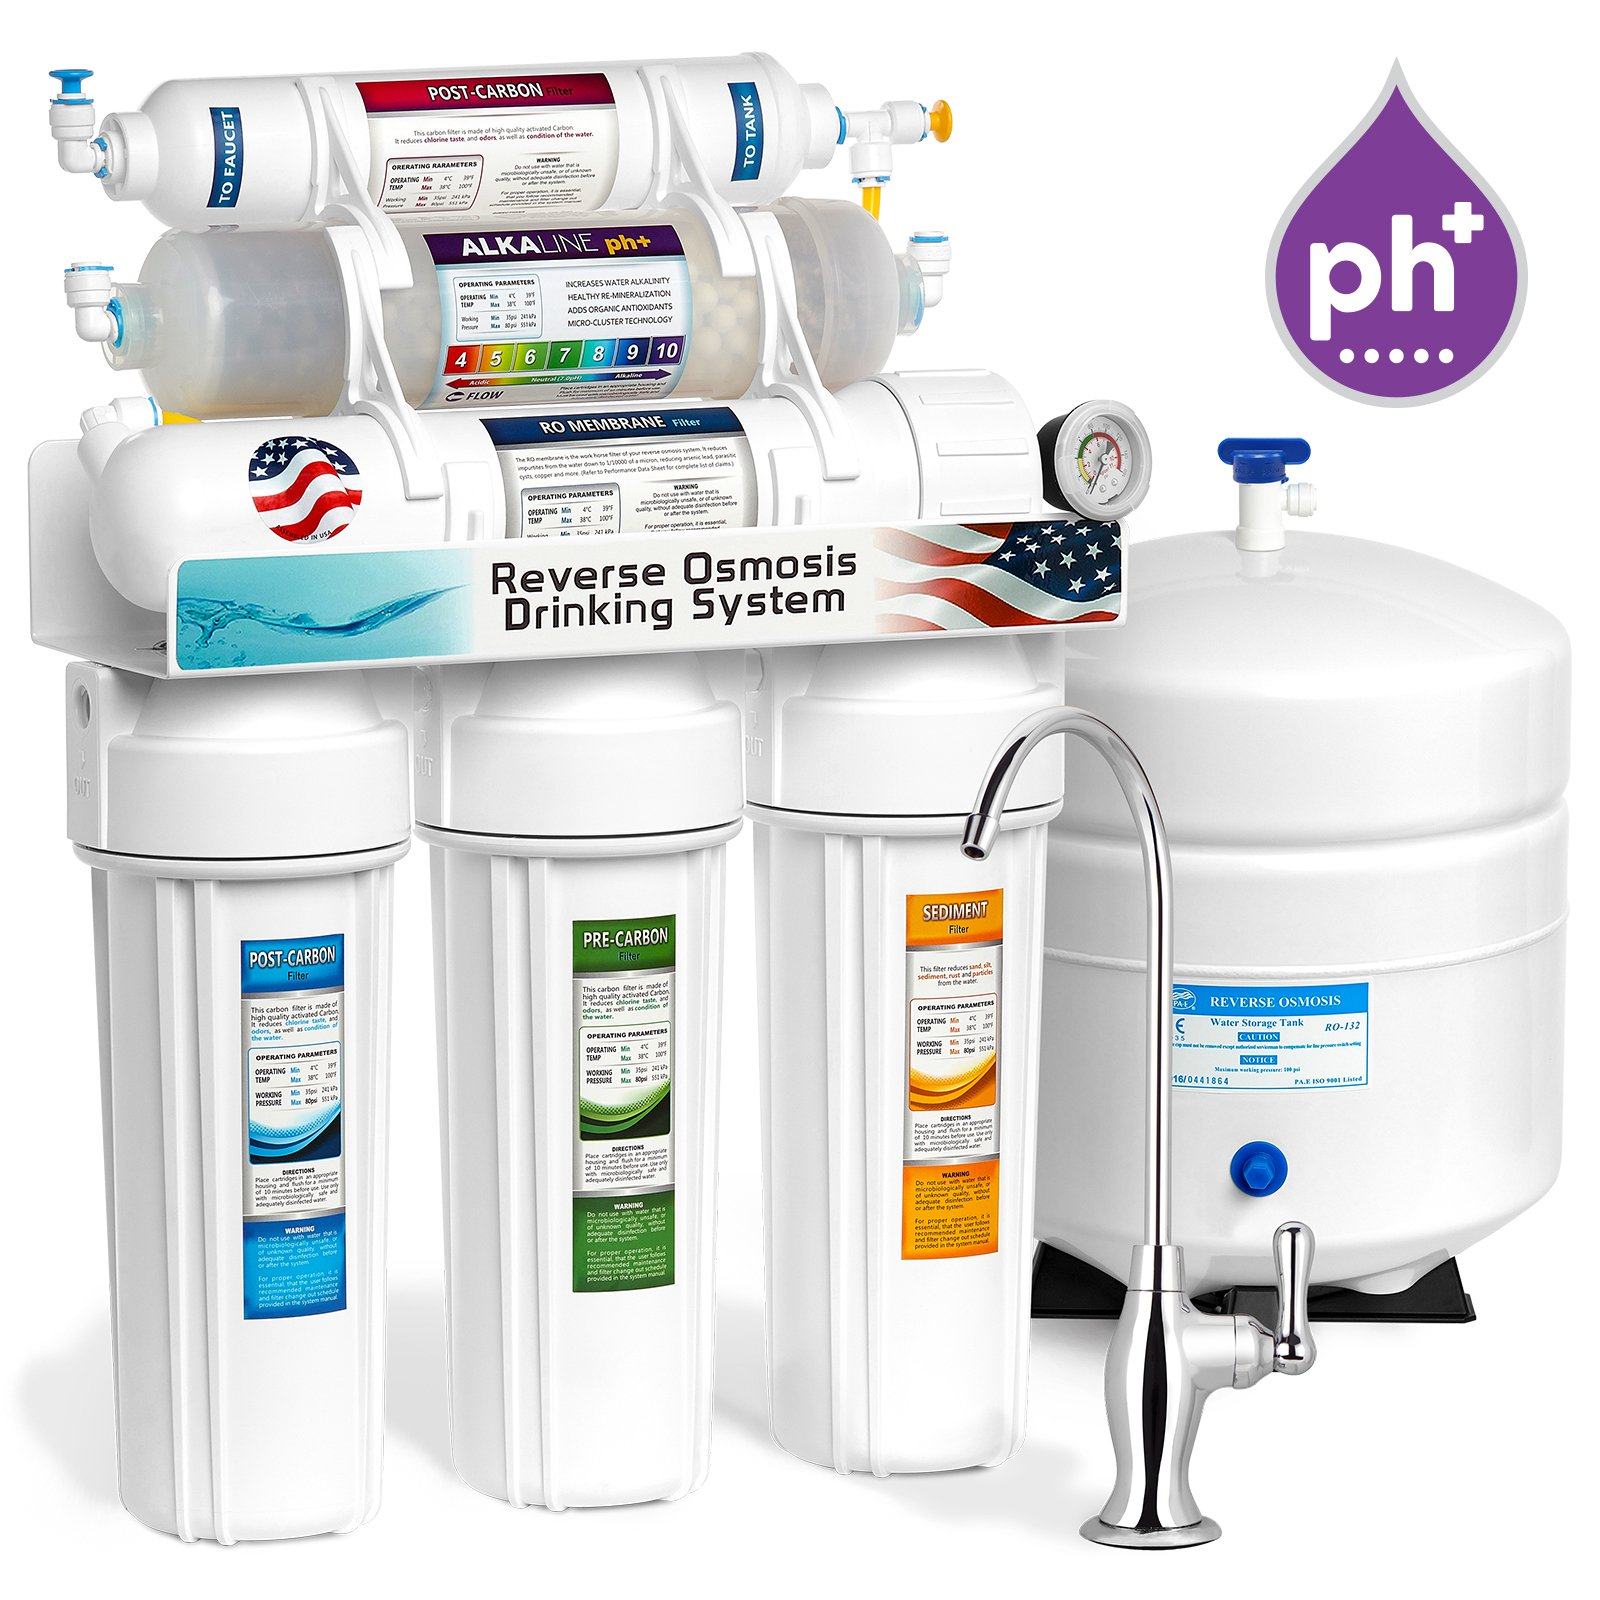 10-STAGE ALKALINE PH+ Home Drinking Reverse Osmosis System complete DELUXE + w/ pressure gauge -ROALK5DG